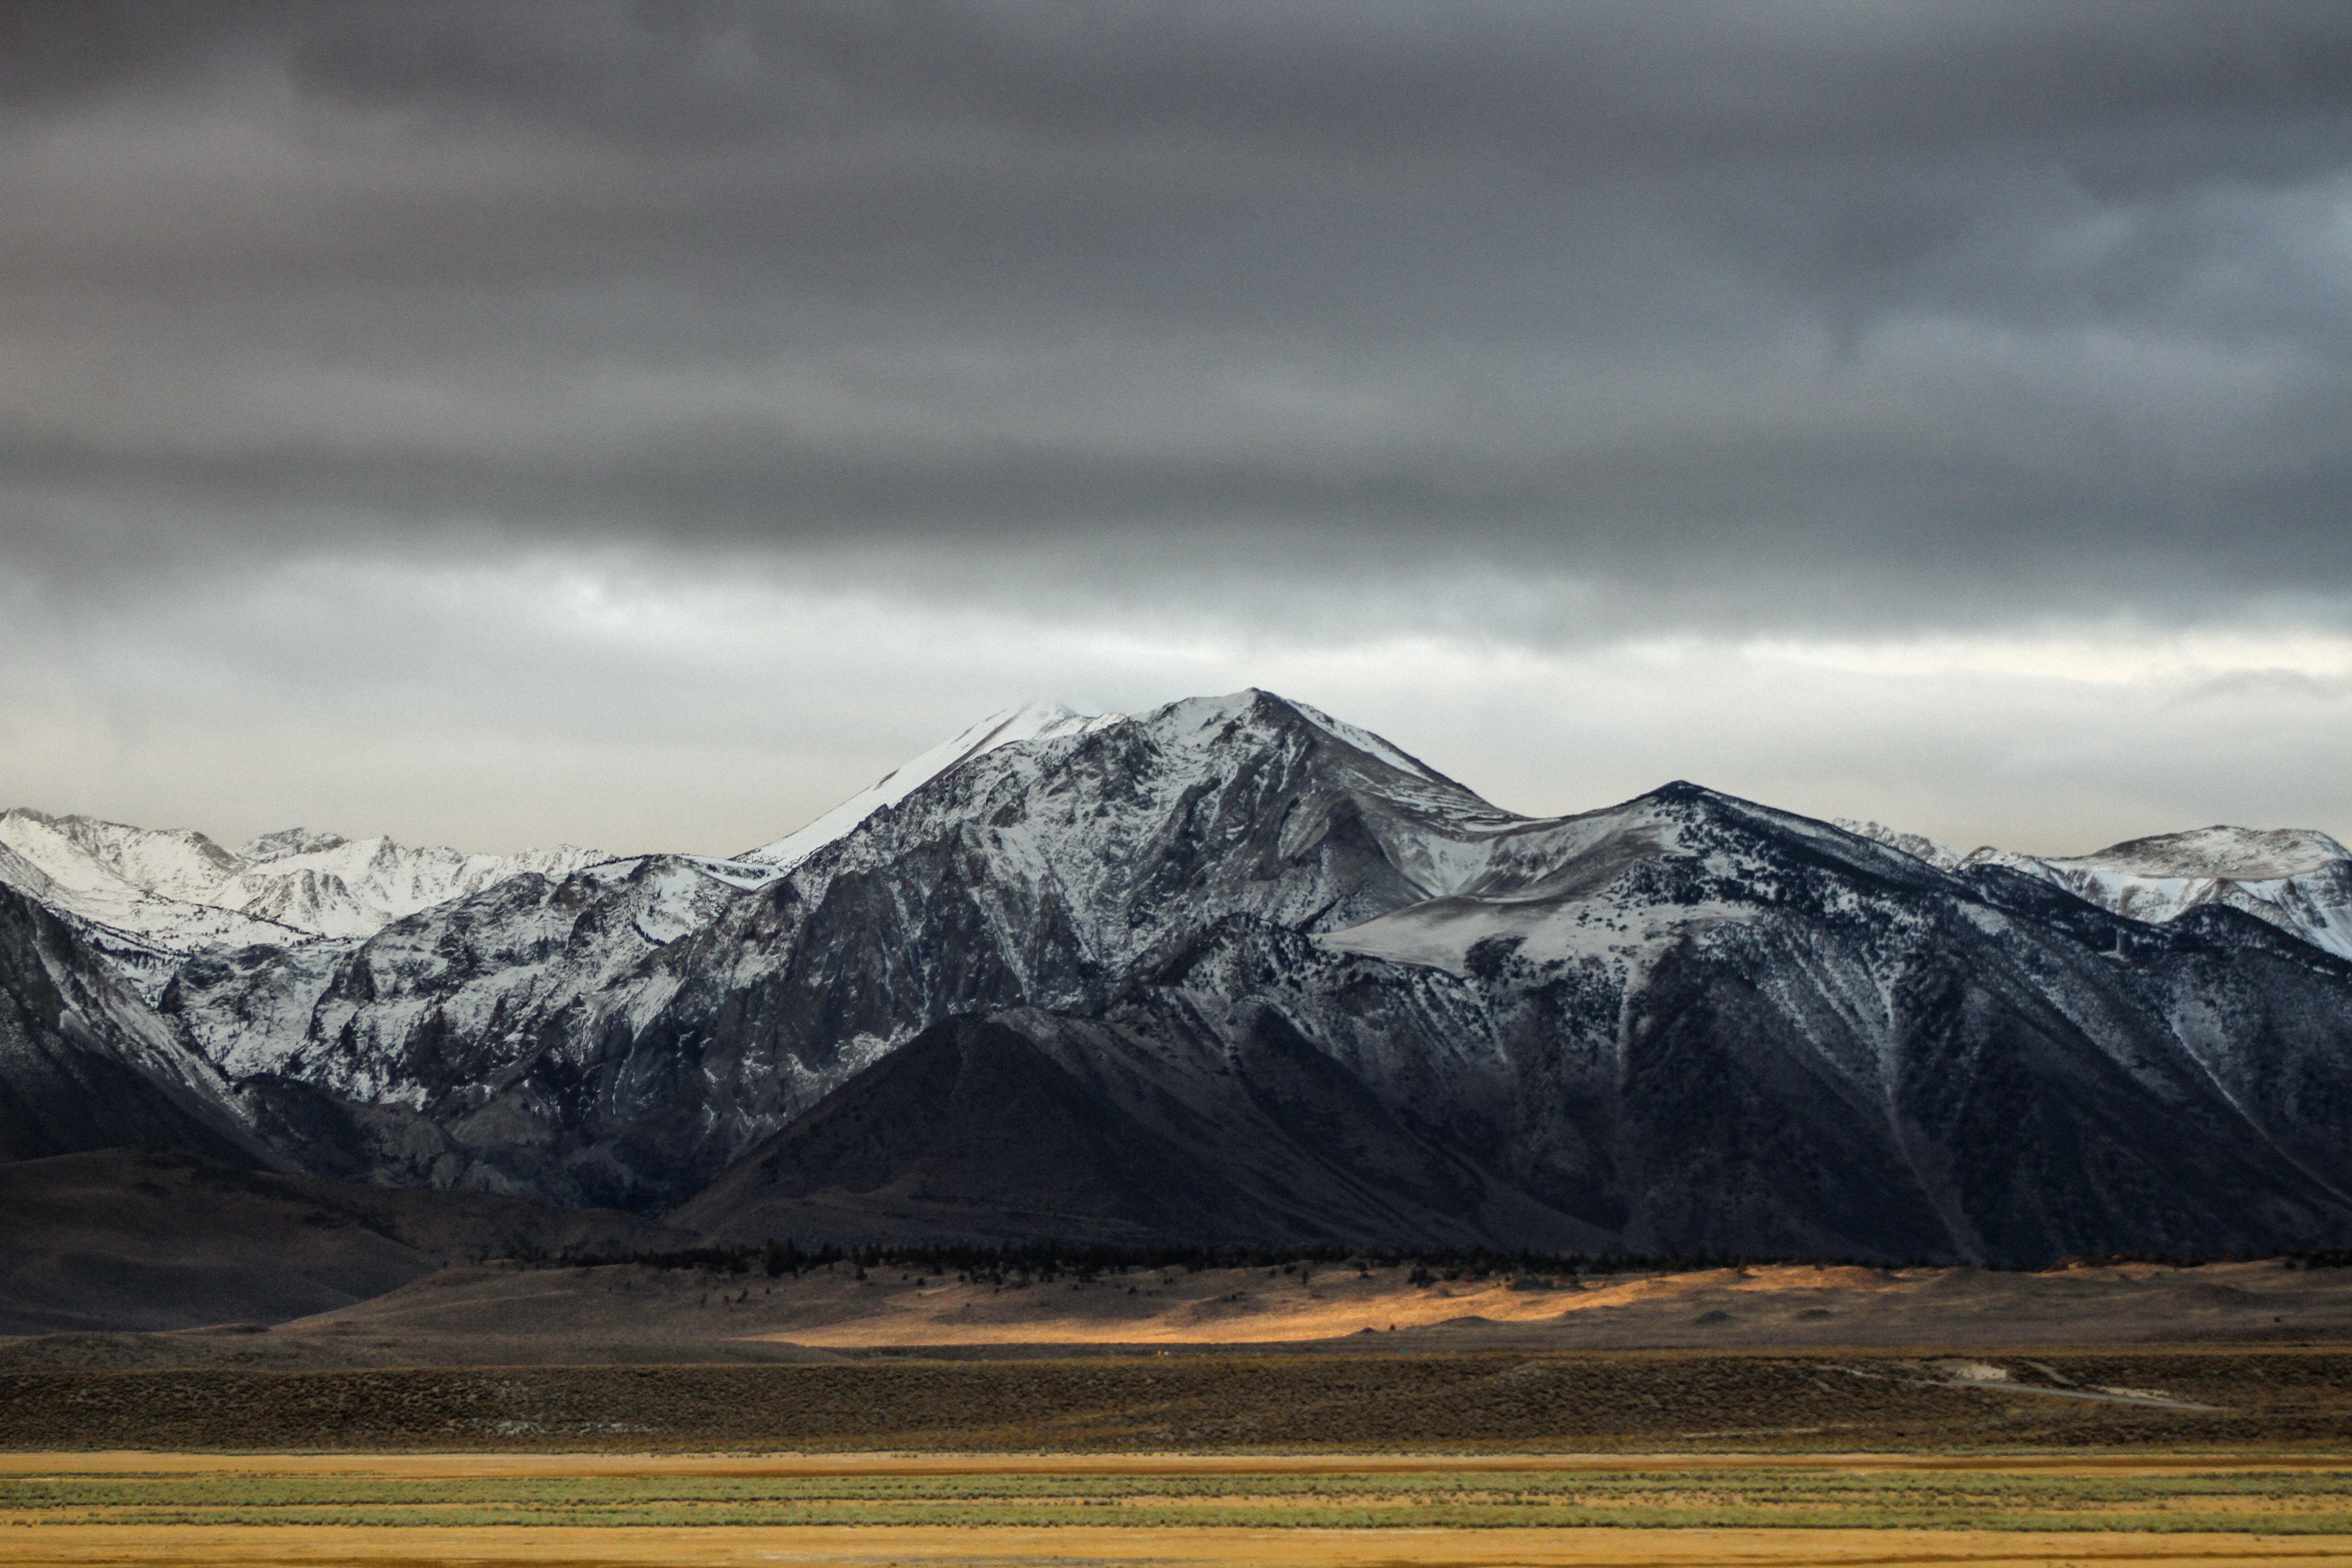 Barren plains stretching below snowy mountains